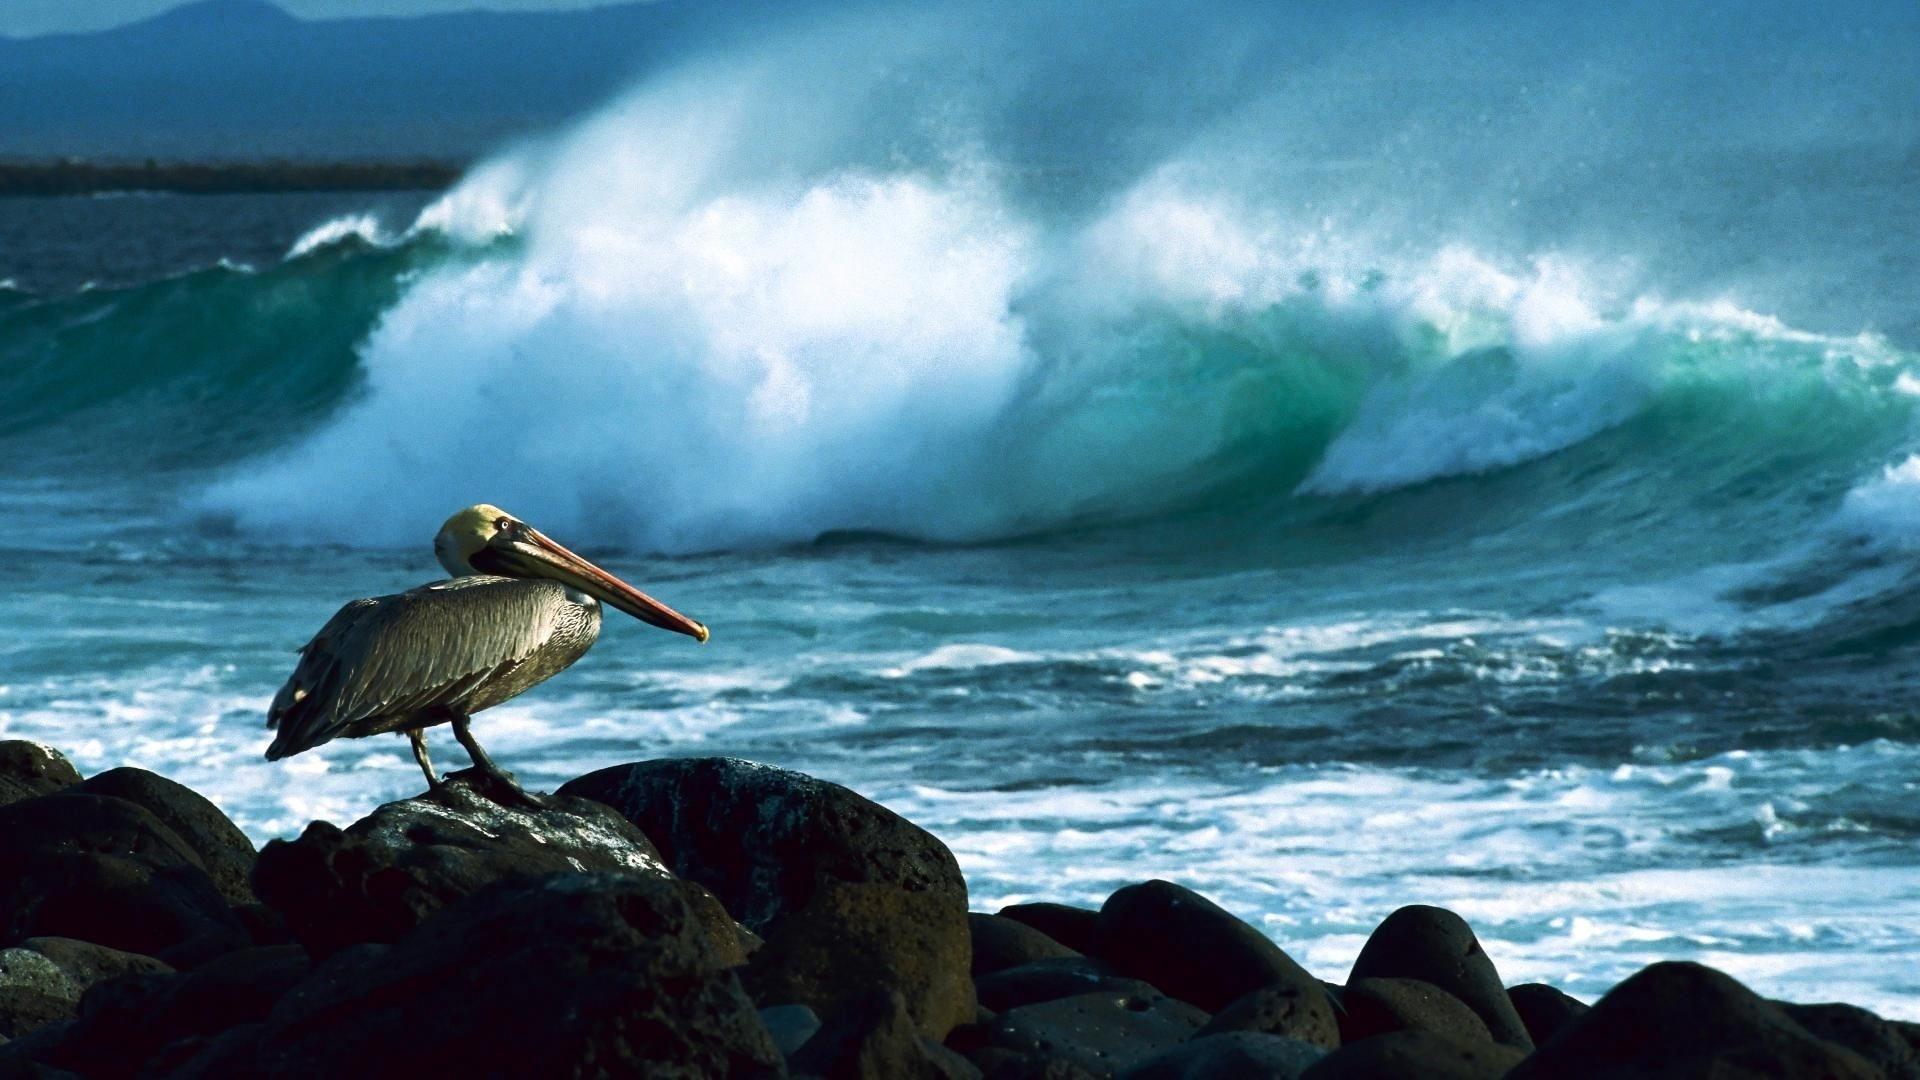 Pelican Wallpaper theme